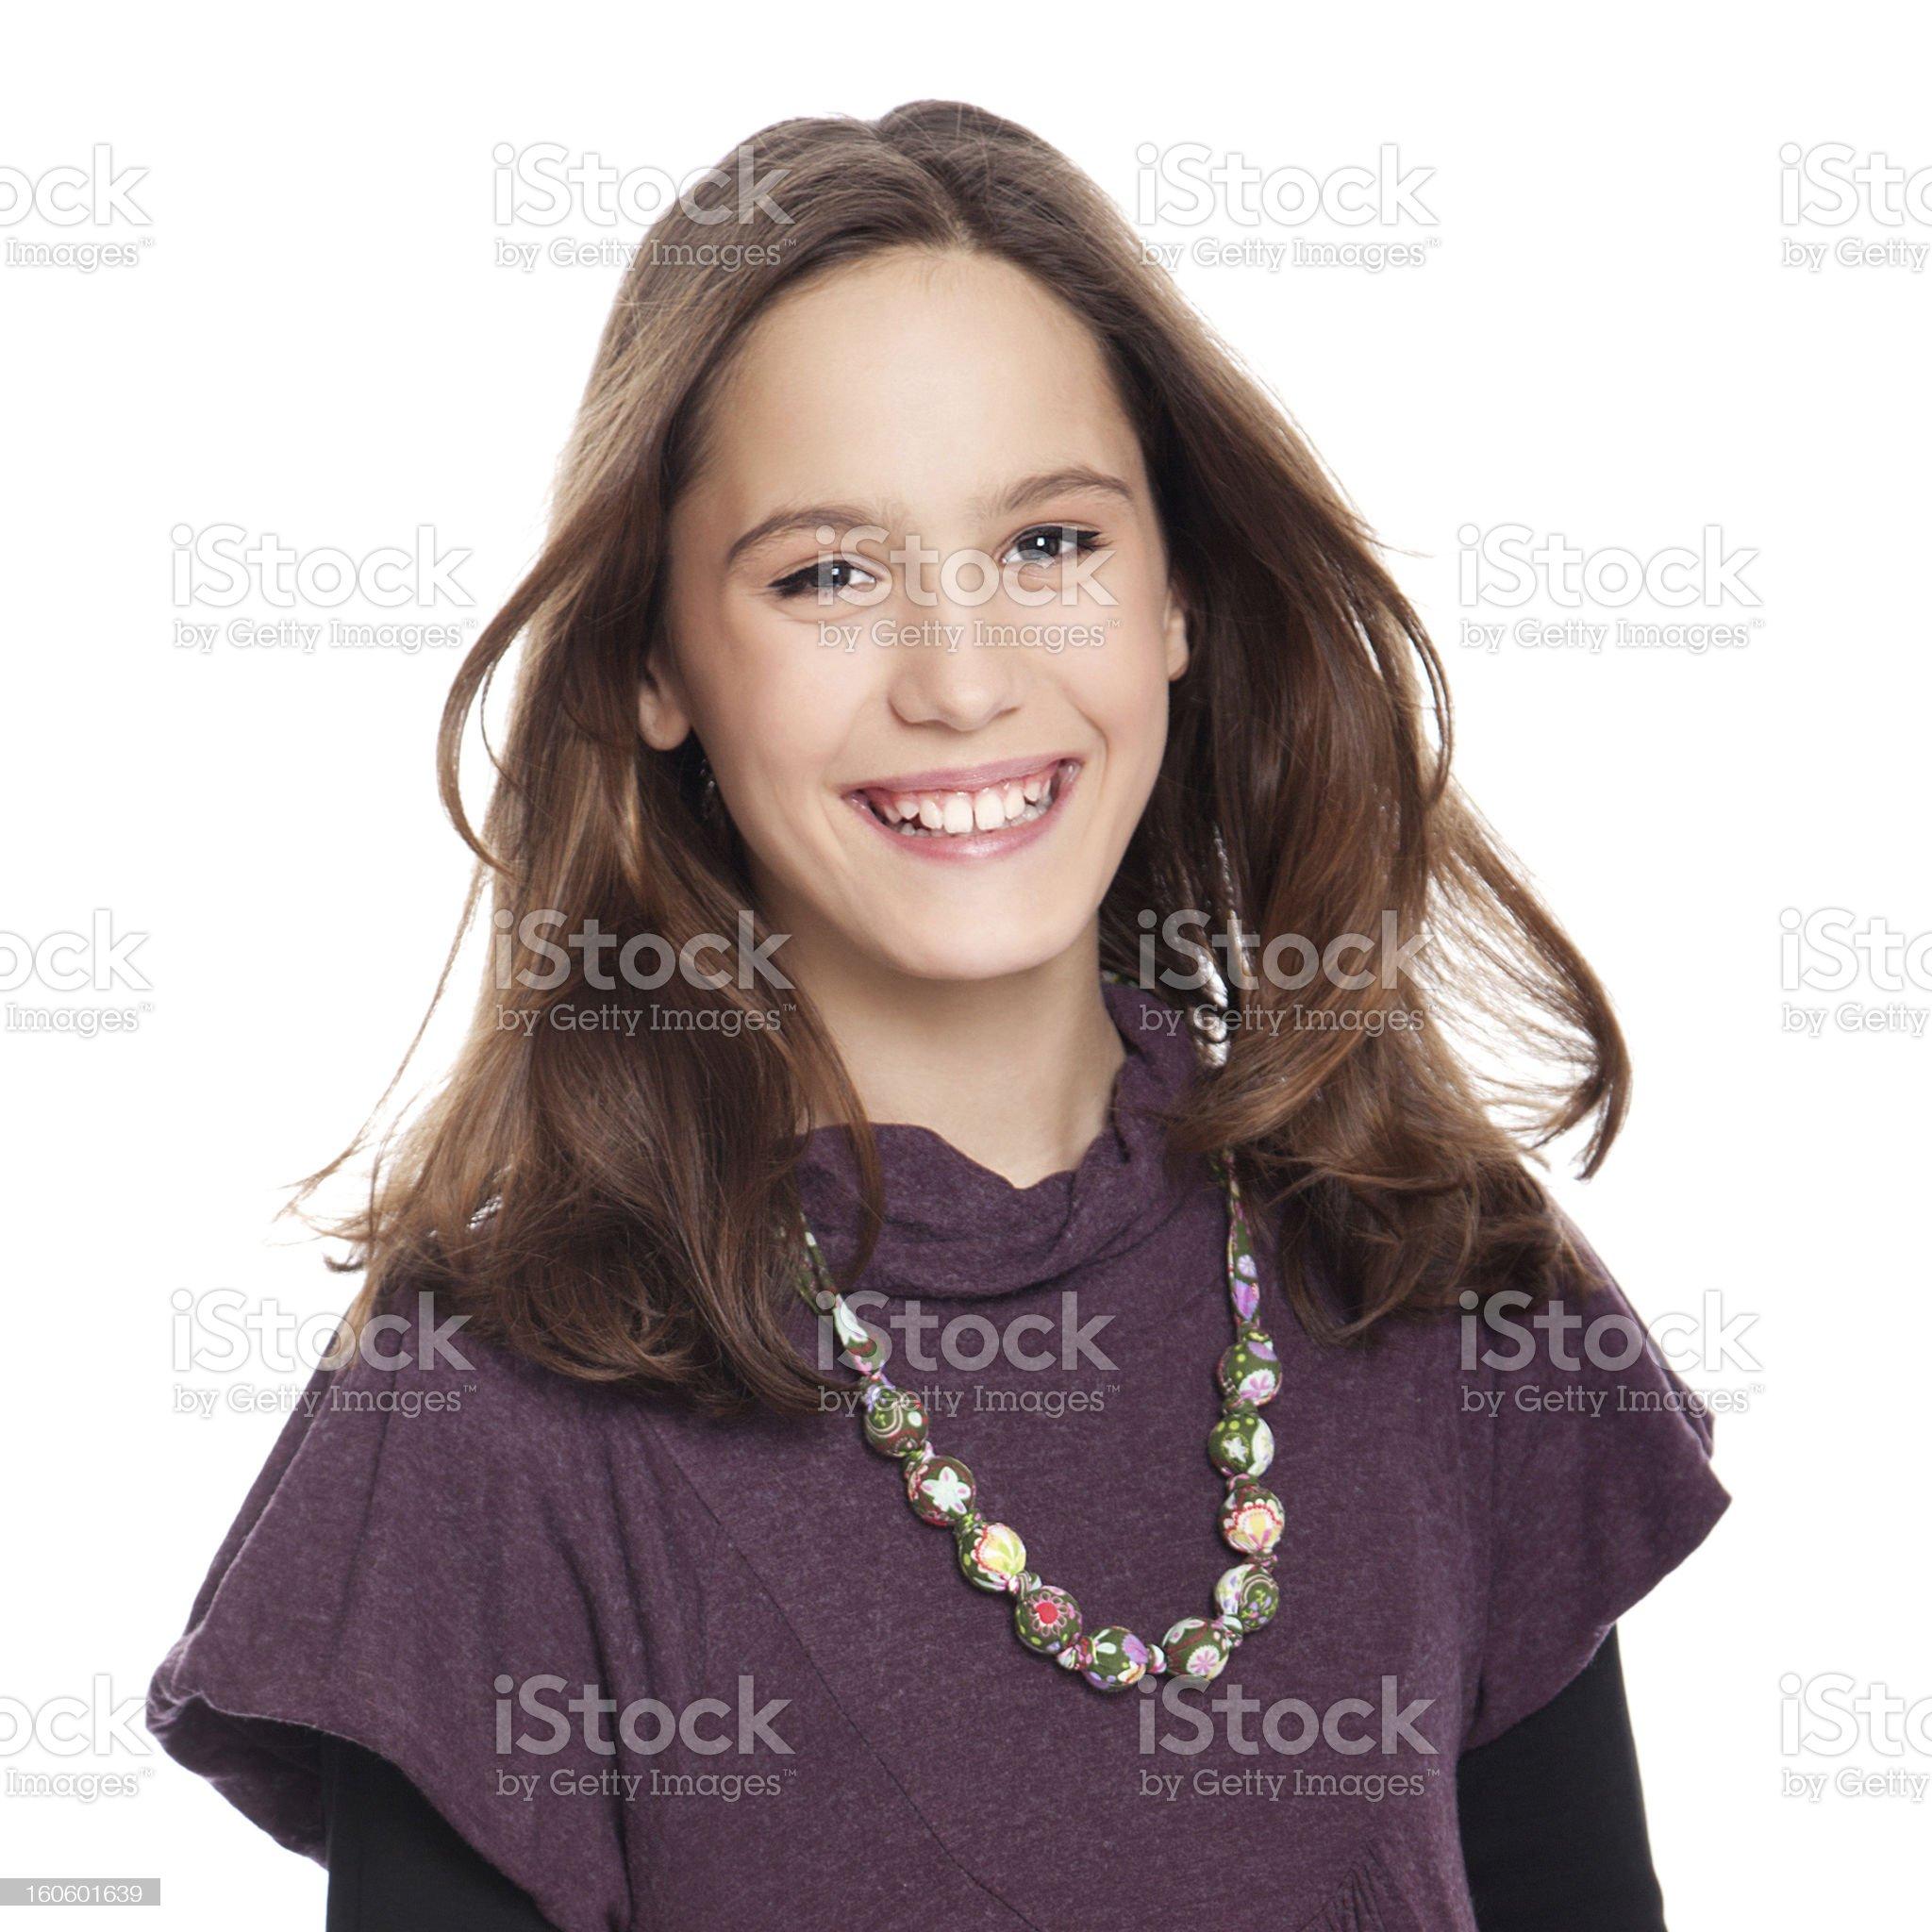 Teenage girl. royalty-free stock photo